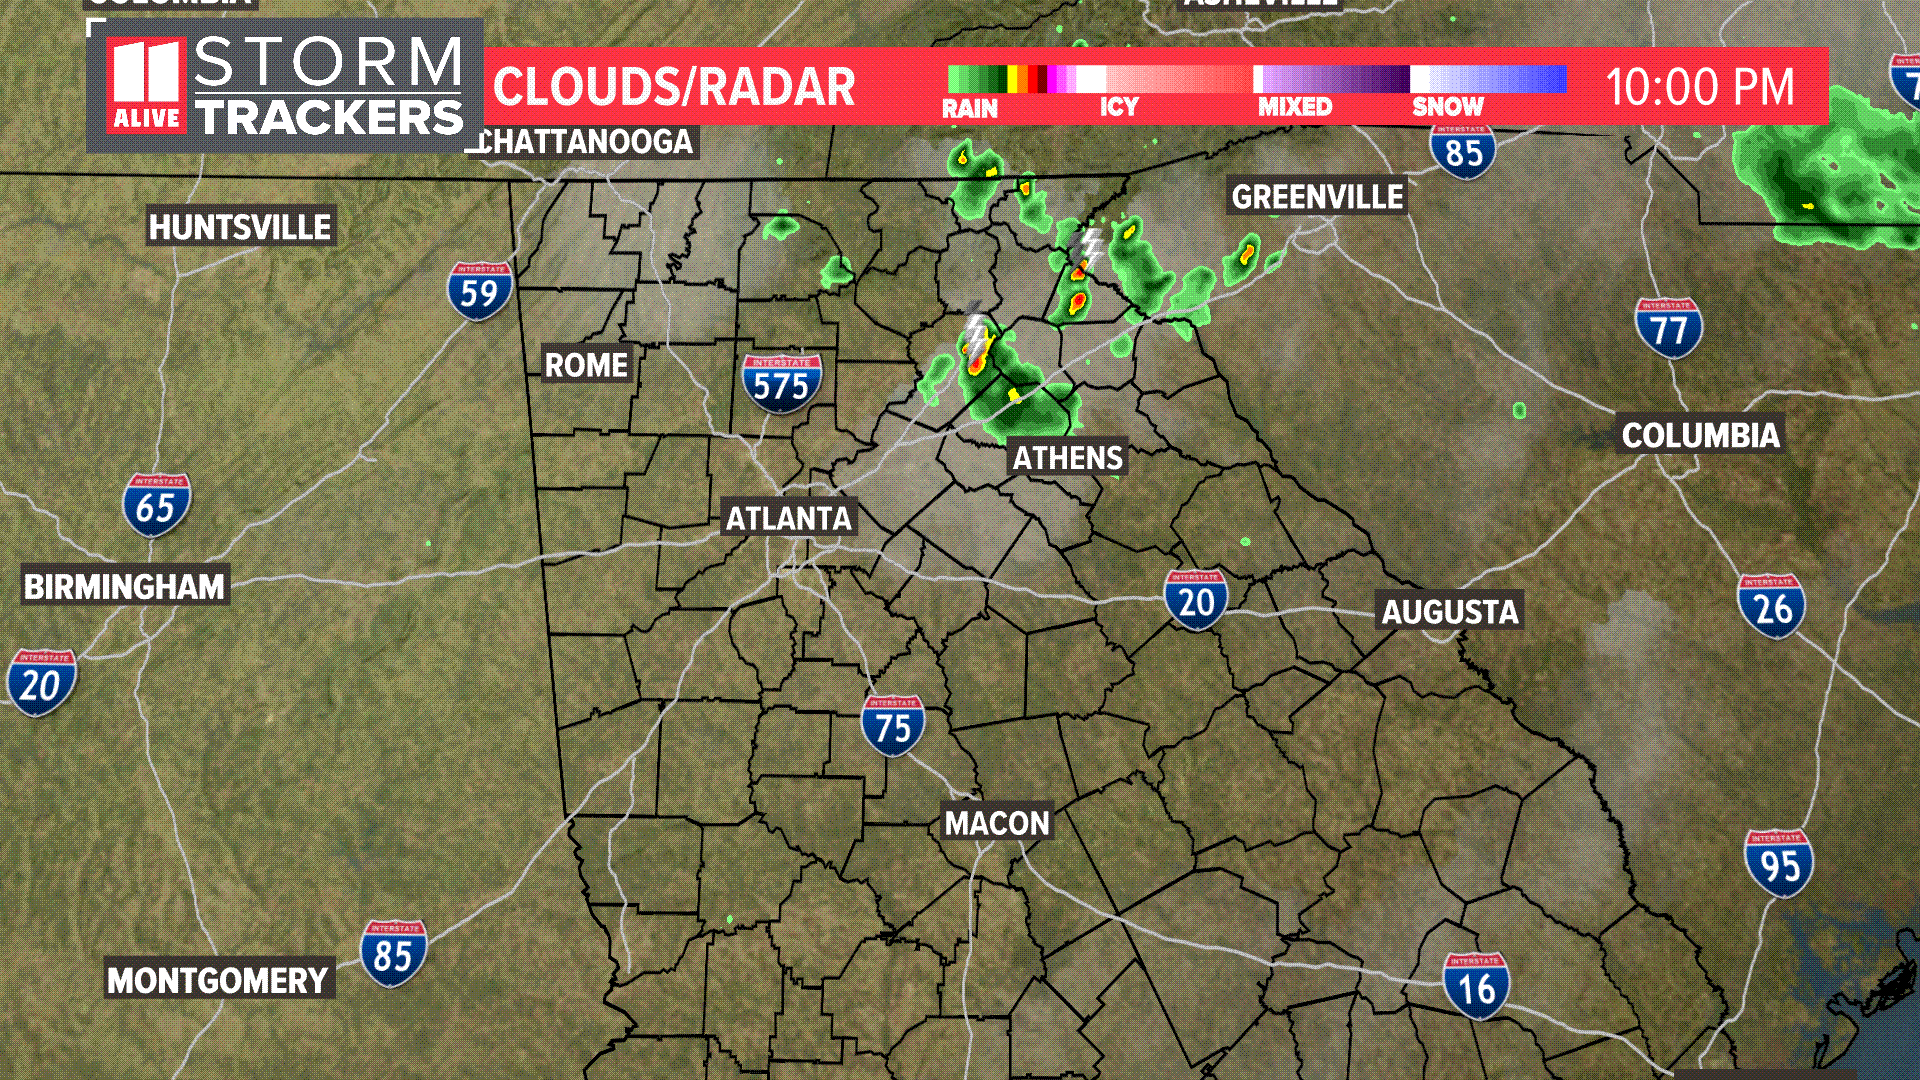 SatRad: Clouds and Rain over north Georgia